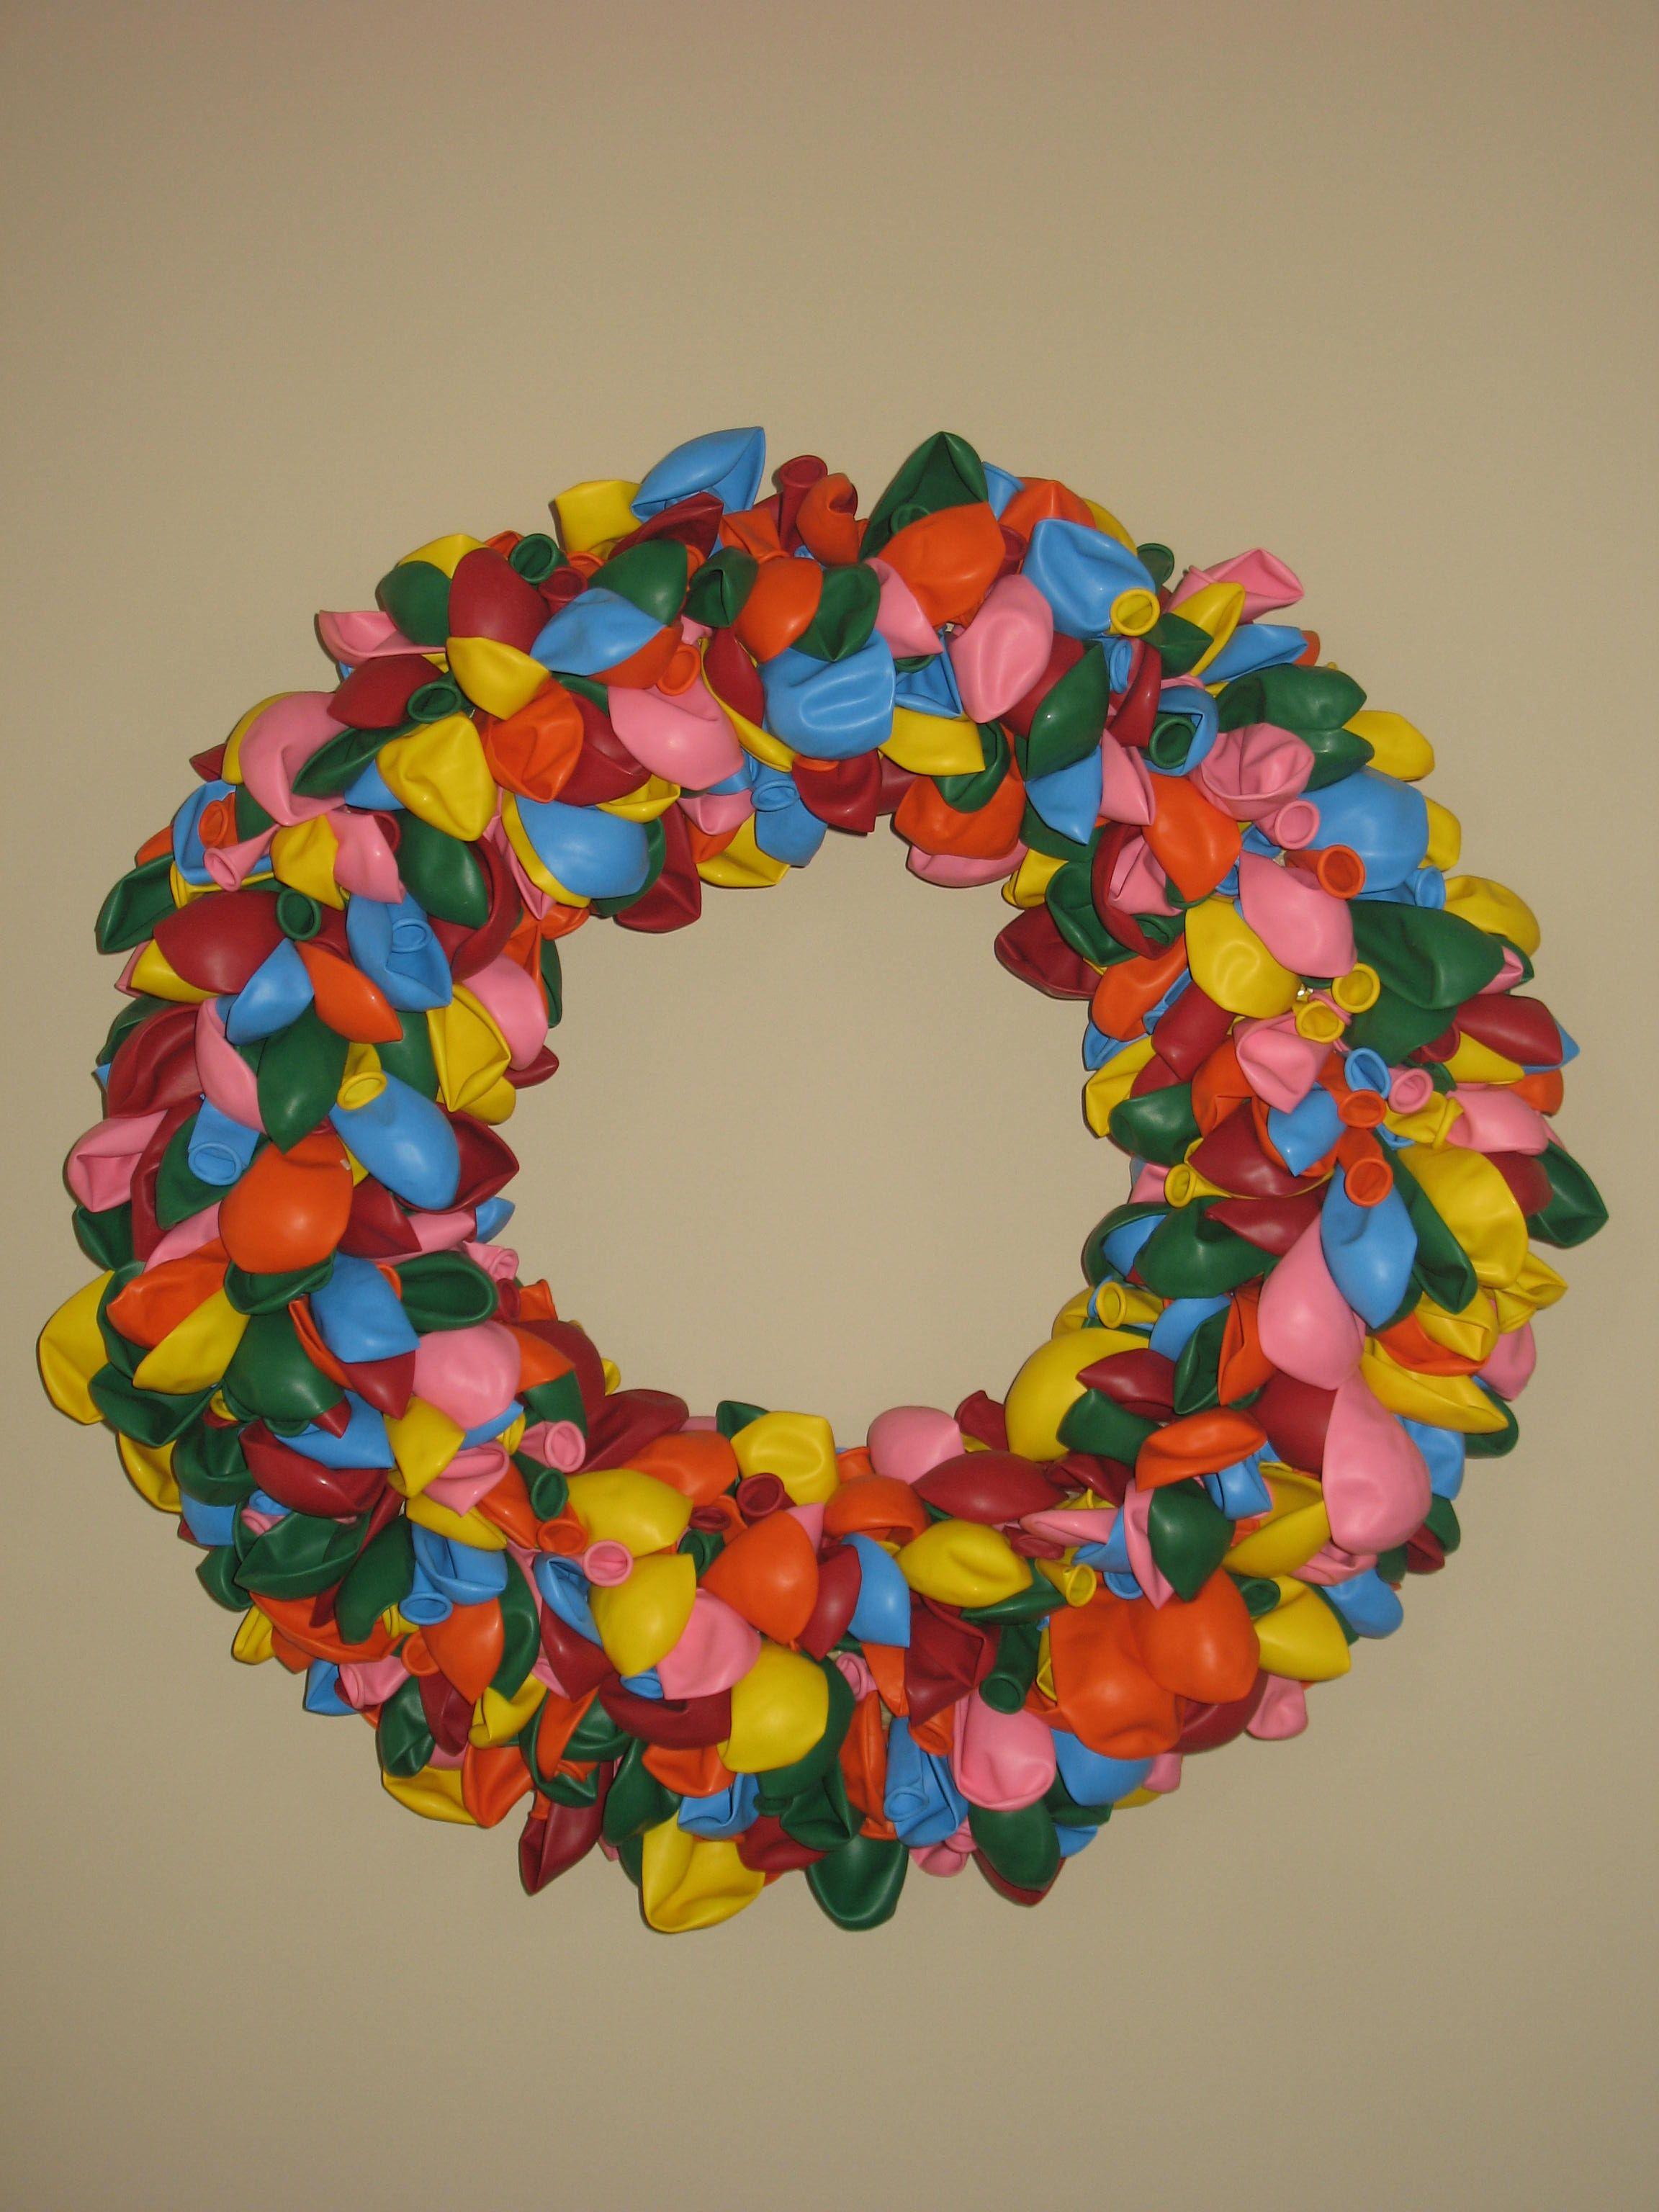 how to make a balloon wreath, seems easy enough